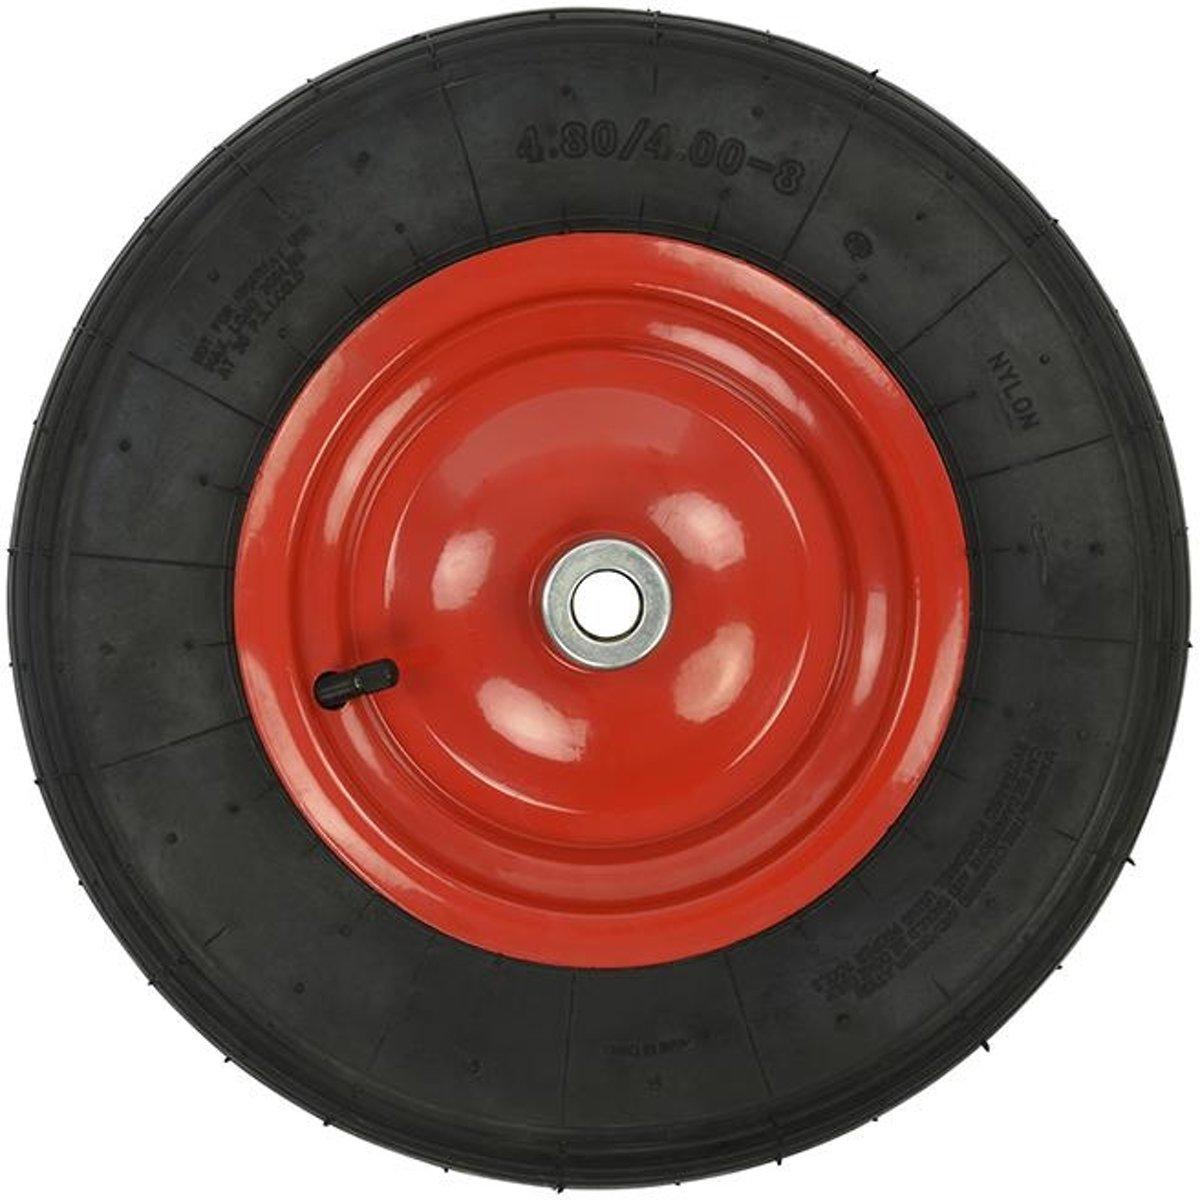 Proplus Kruiwagenwiel Rubber/staal 16 Inch Zwart/rood kopen